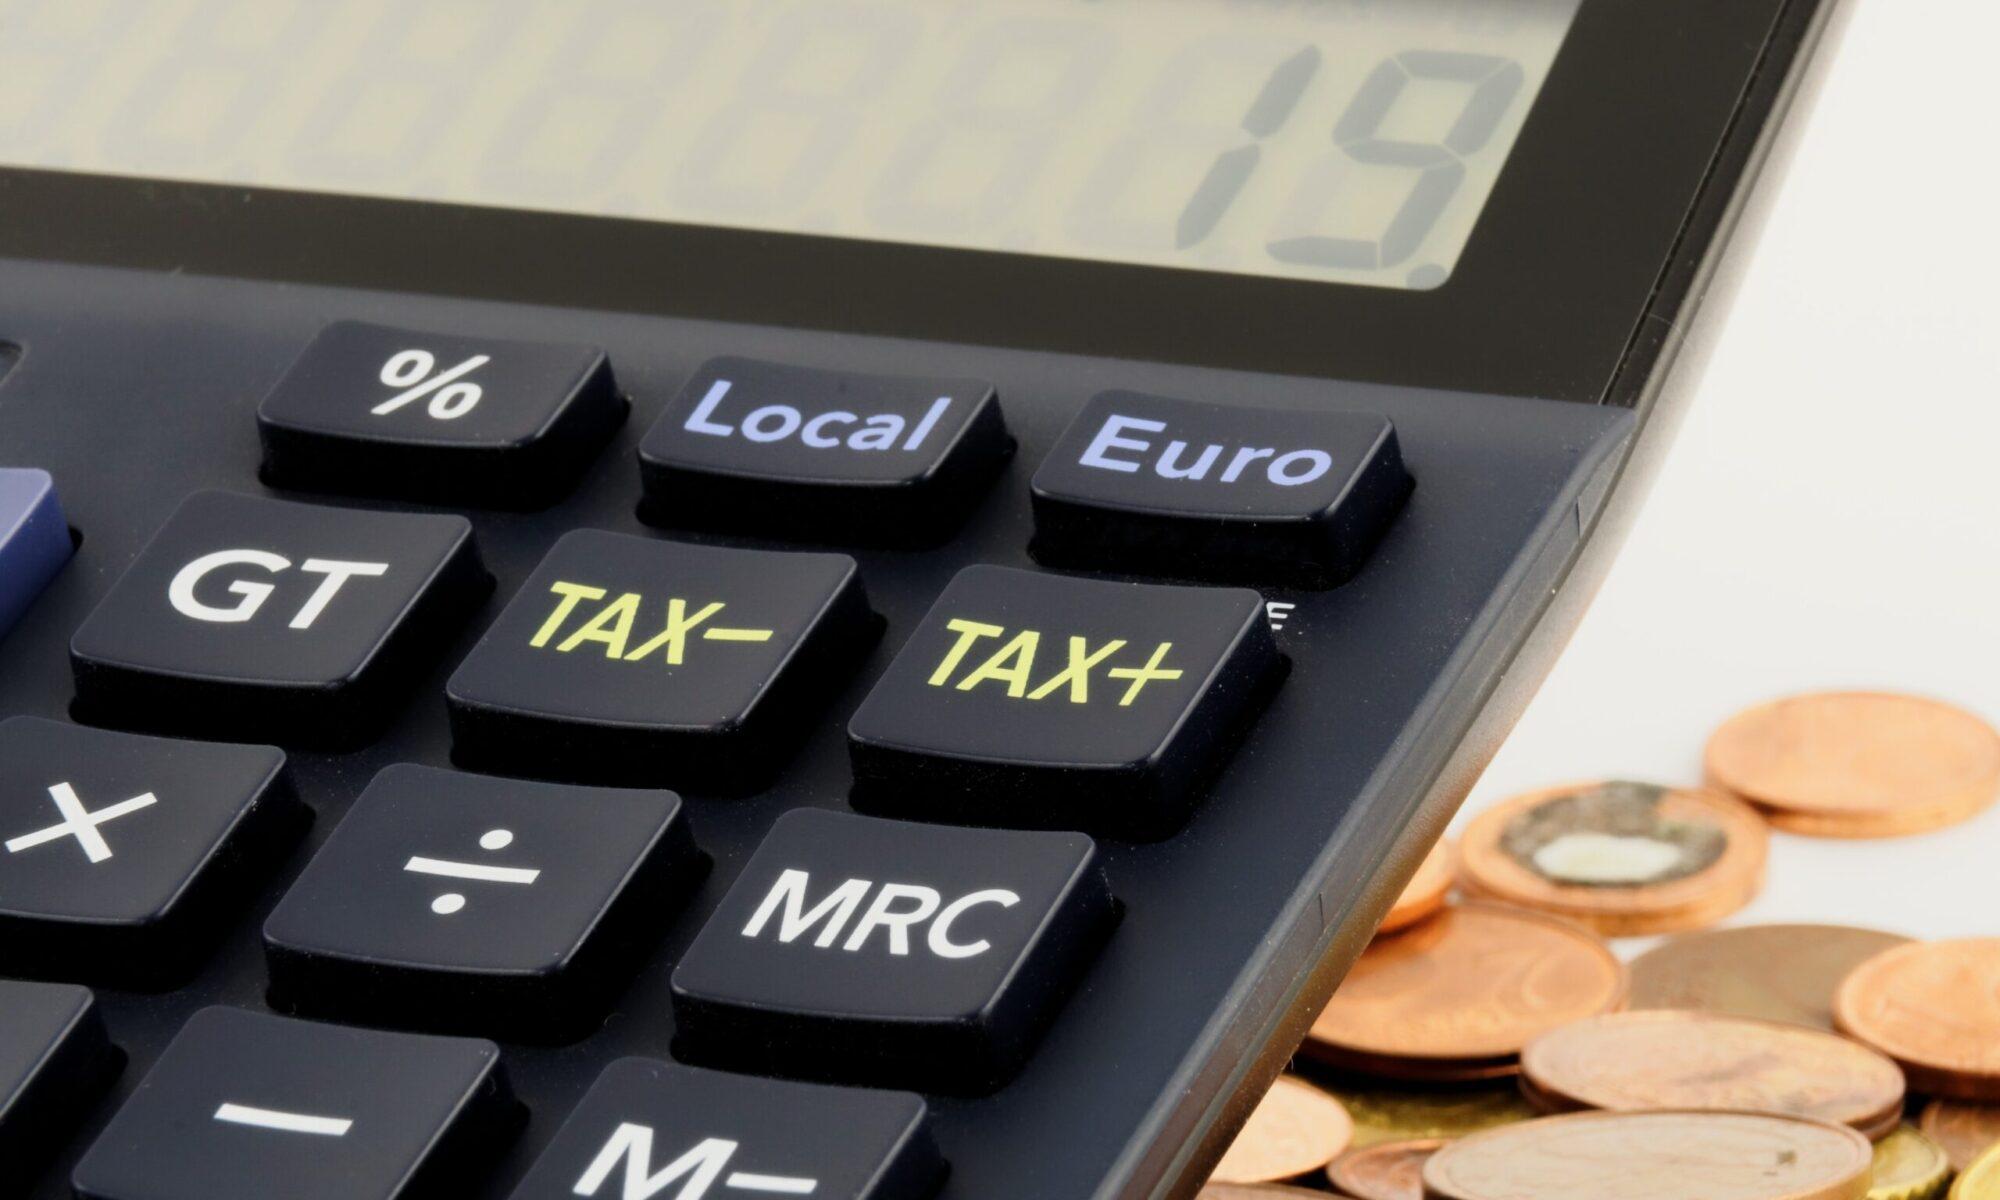 Karlexco Accounting/Comptabilité